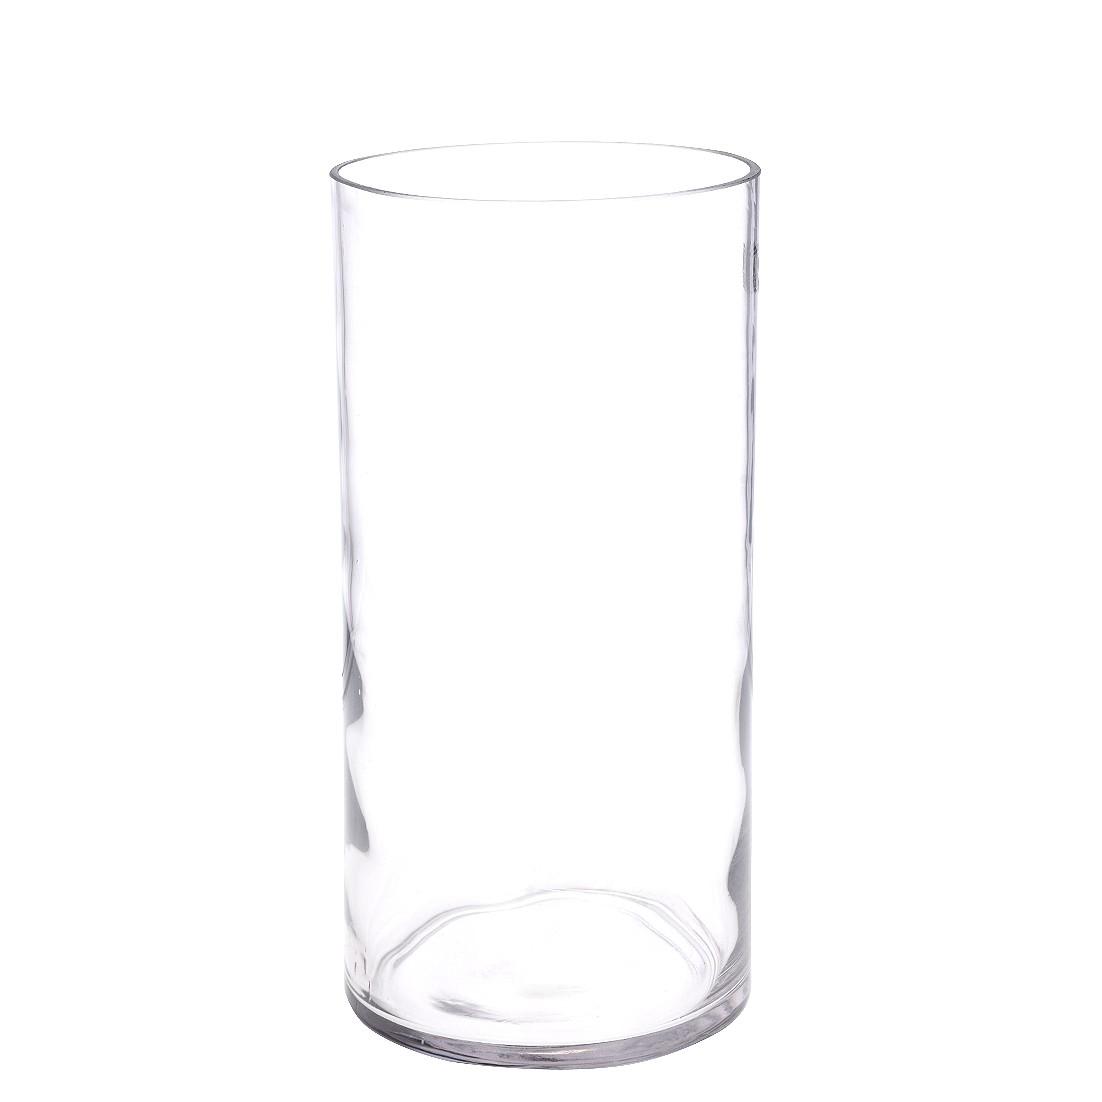 Vaso Decorativo de Vidro Redondo 295 cm Transparente - GPresentes